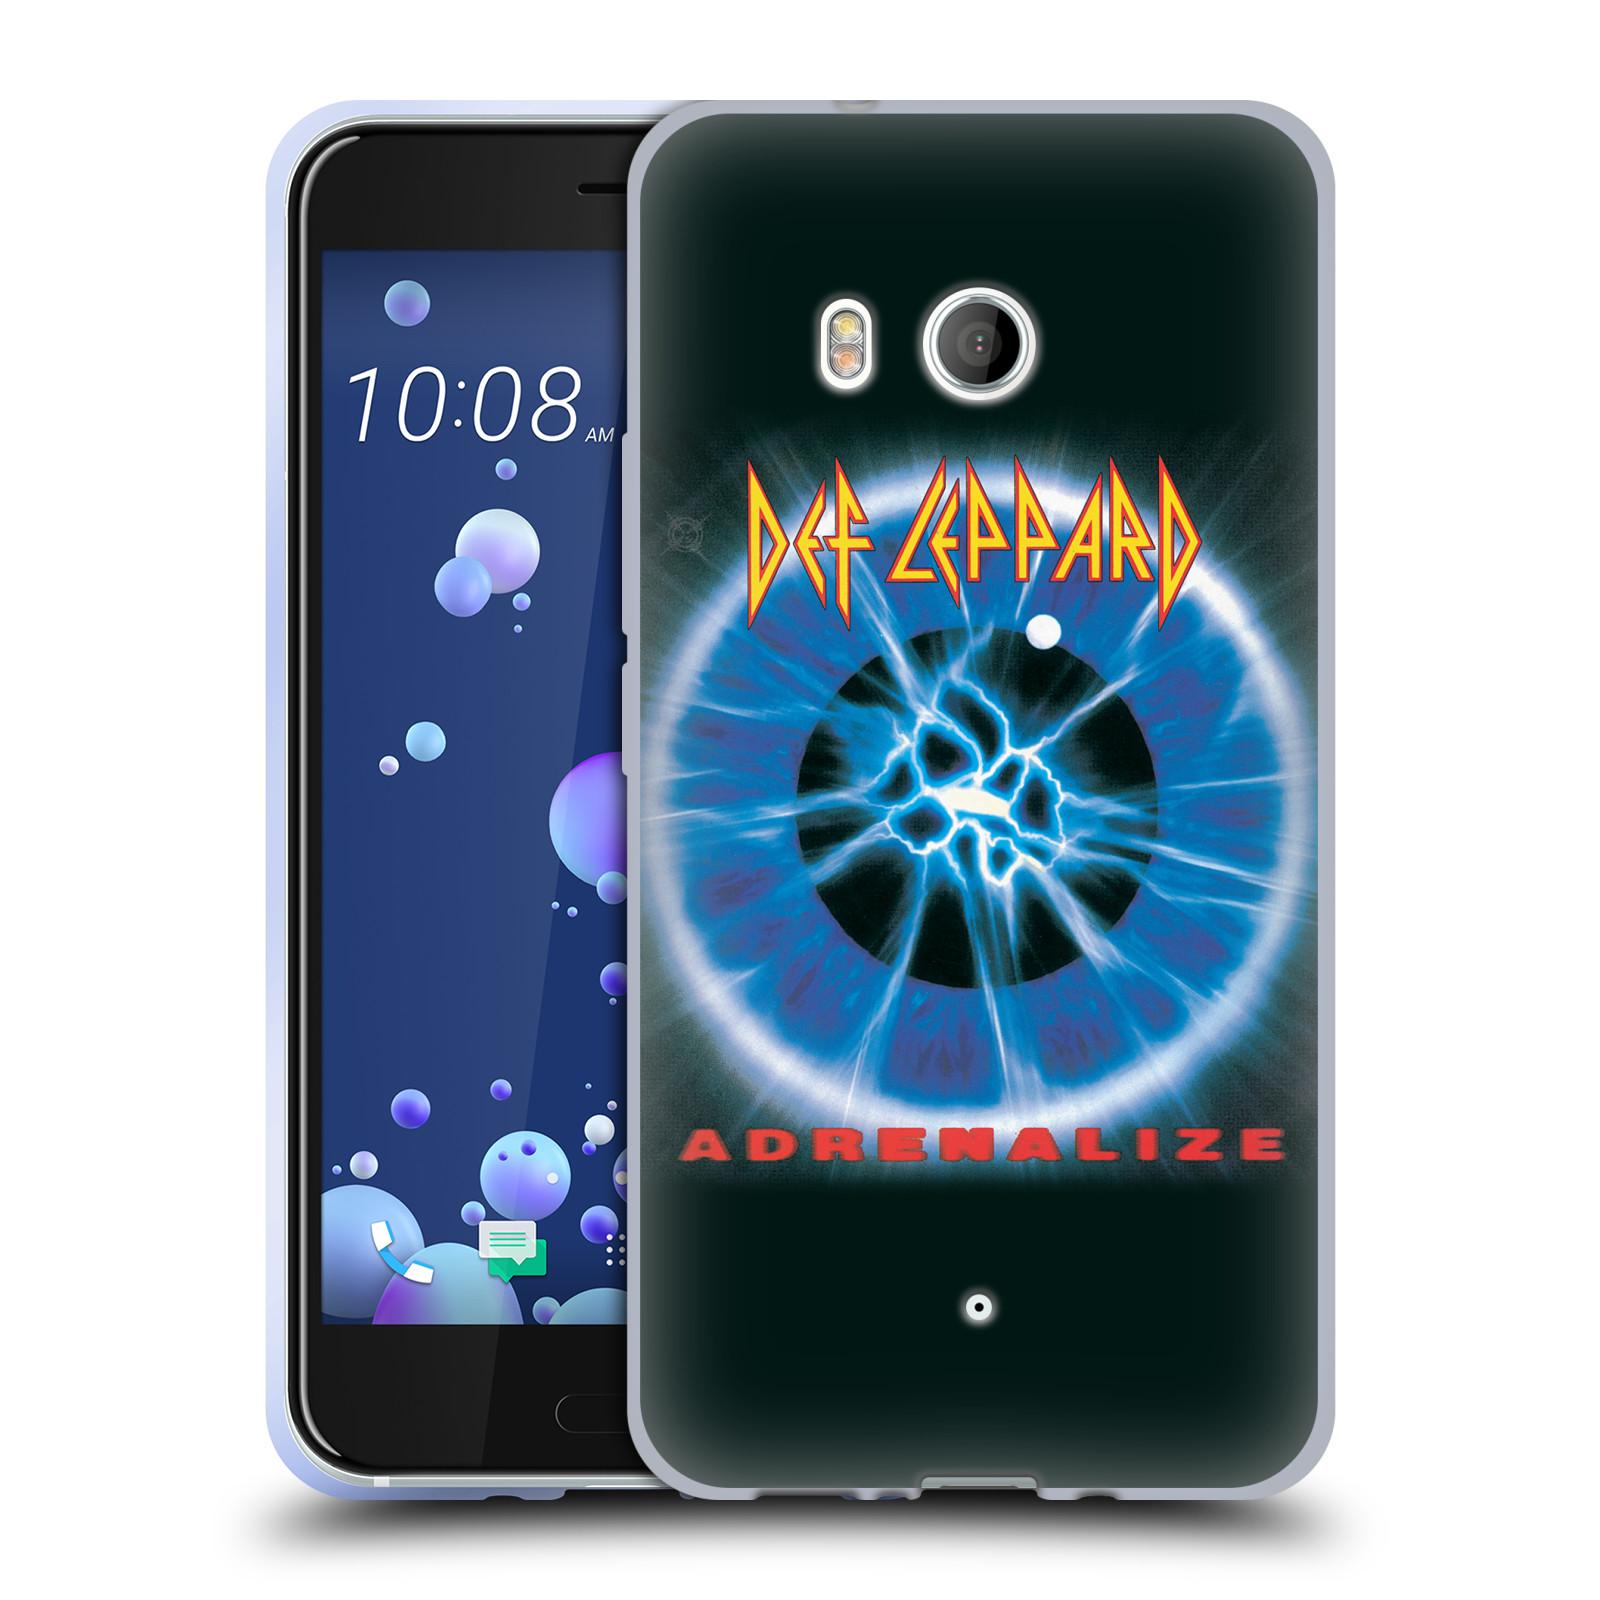 Oficial-Def-Leppard-albumes-De-Gel-Suave-Estuche-Para-HTC-Telefonos-1